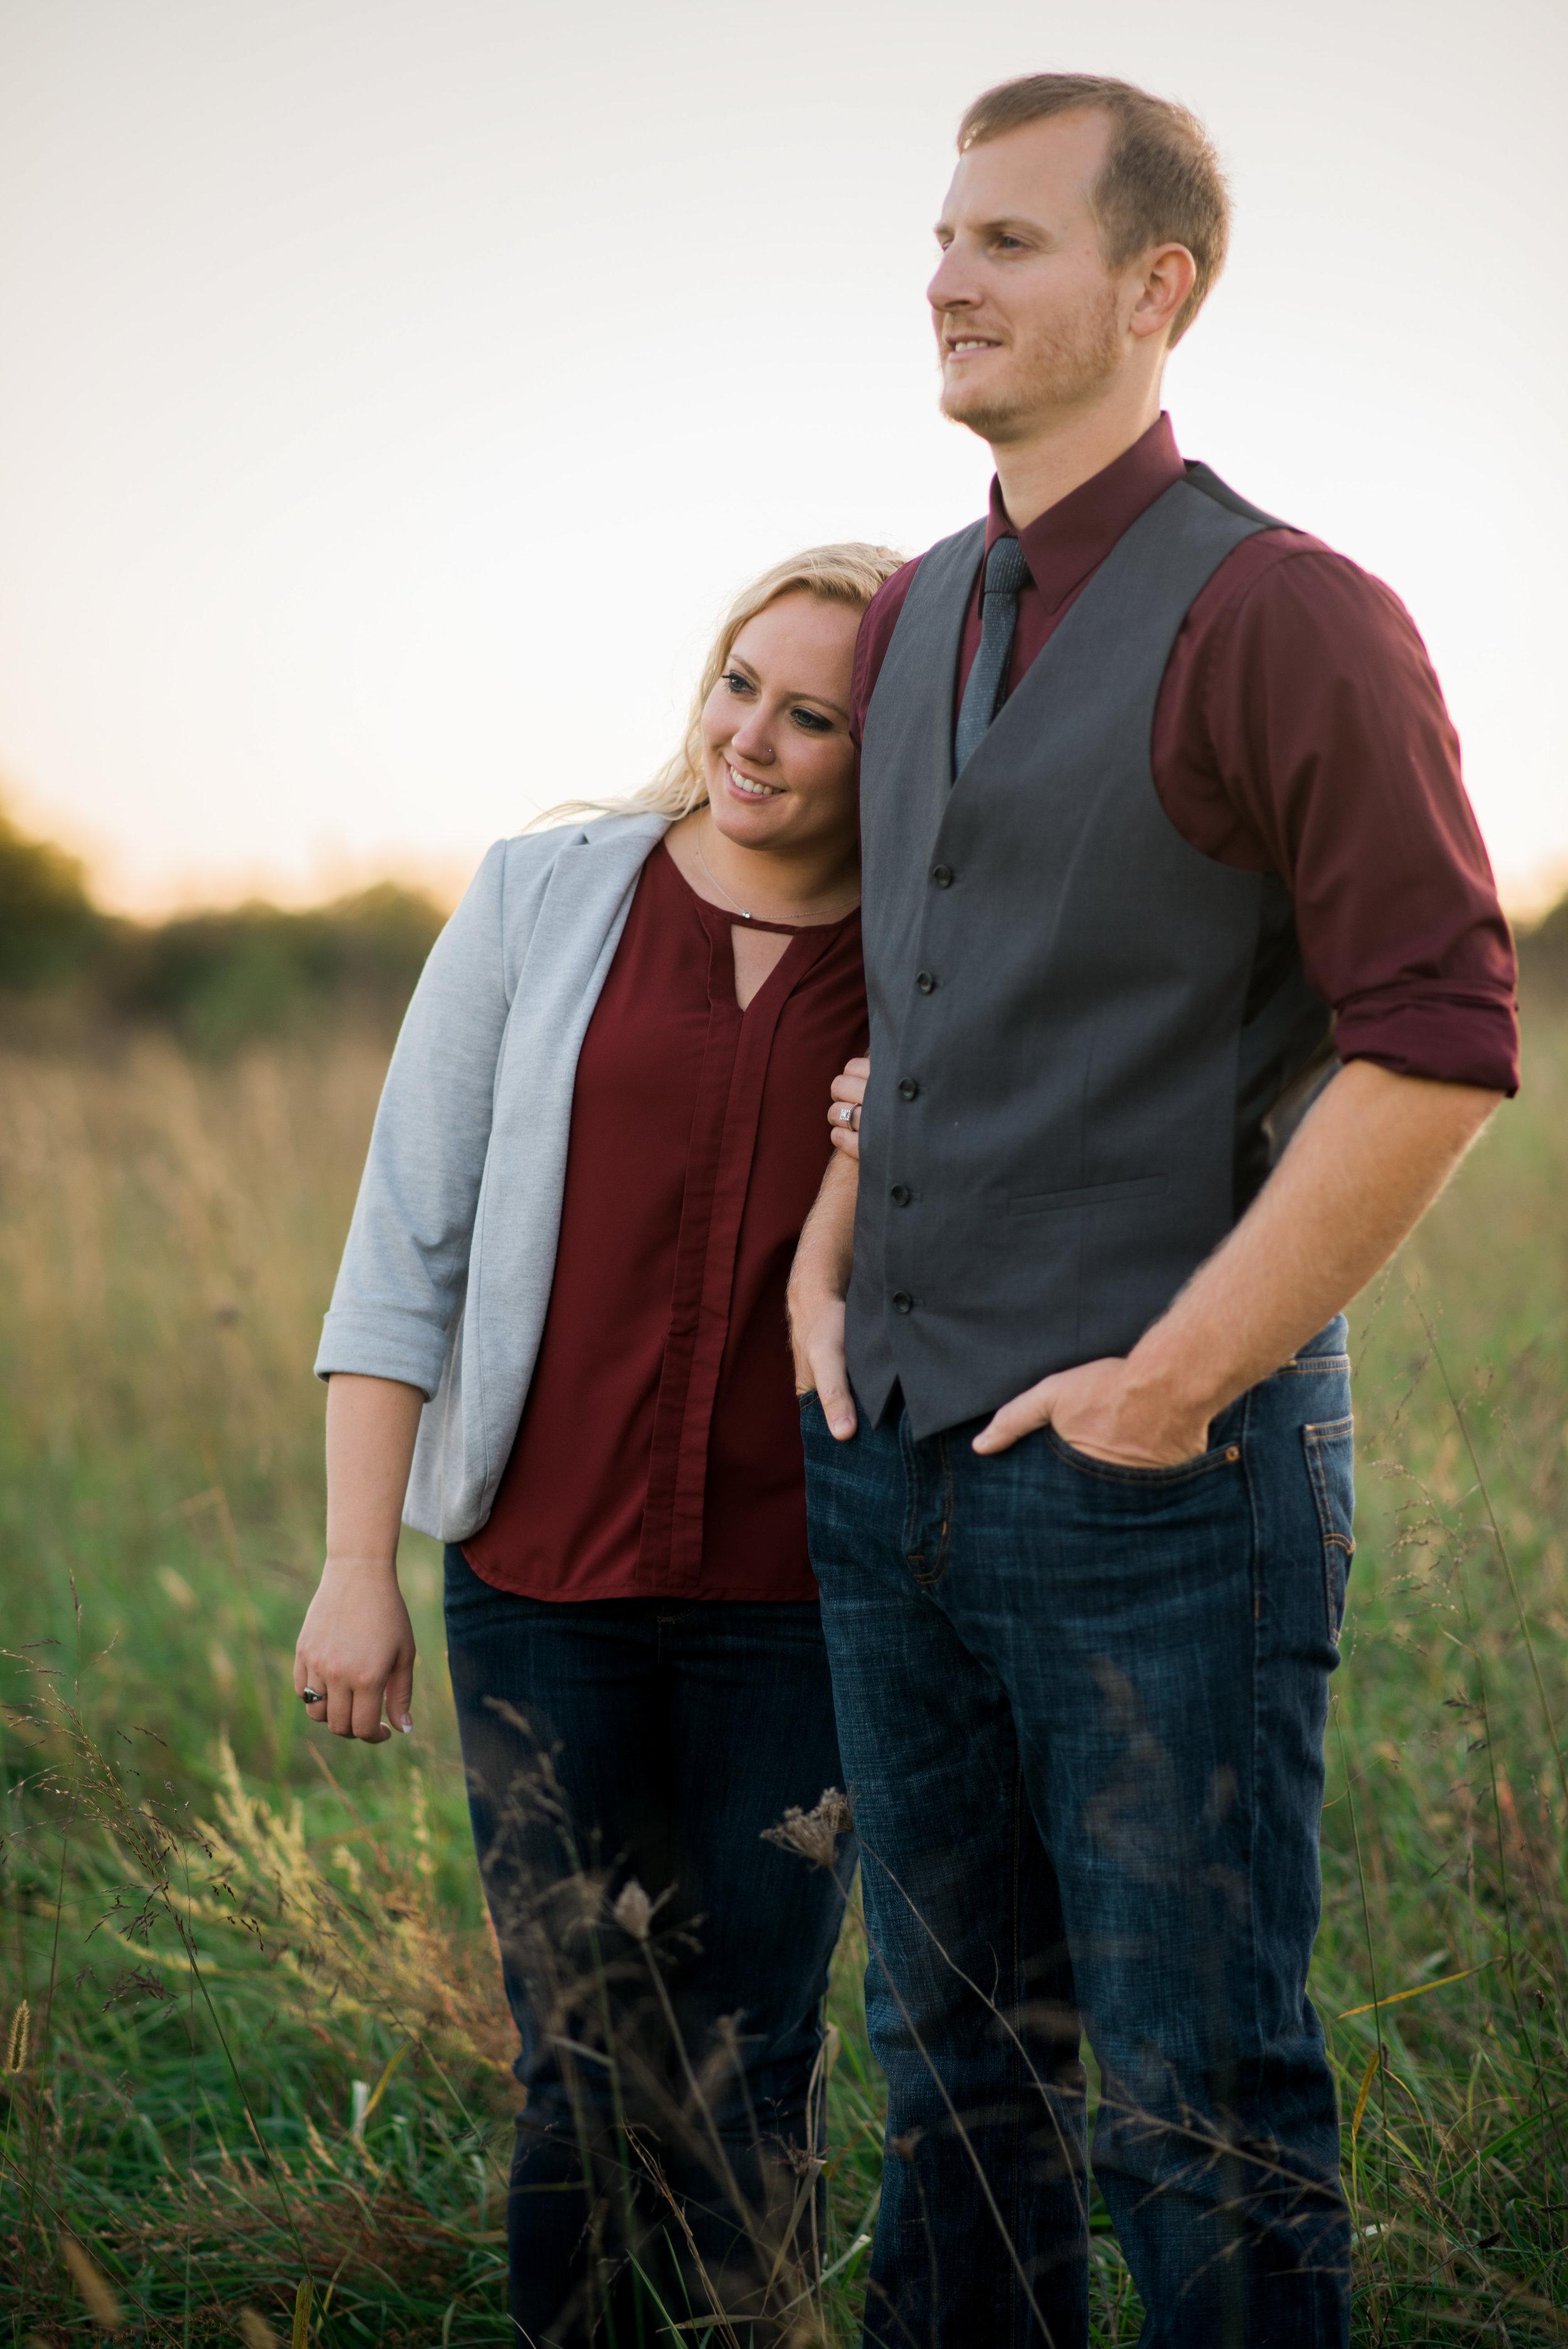 Lynchburg_College_Sorella_Farms_Baseball_Ballet_Virginia_Engagement_Session_Wedding_Photographers (87).jpg